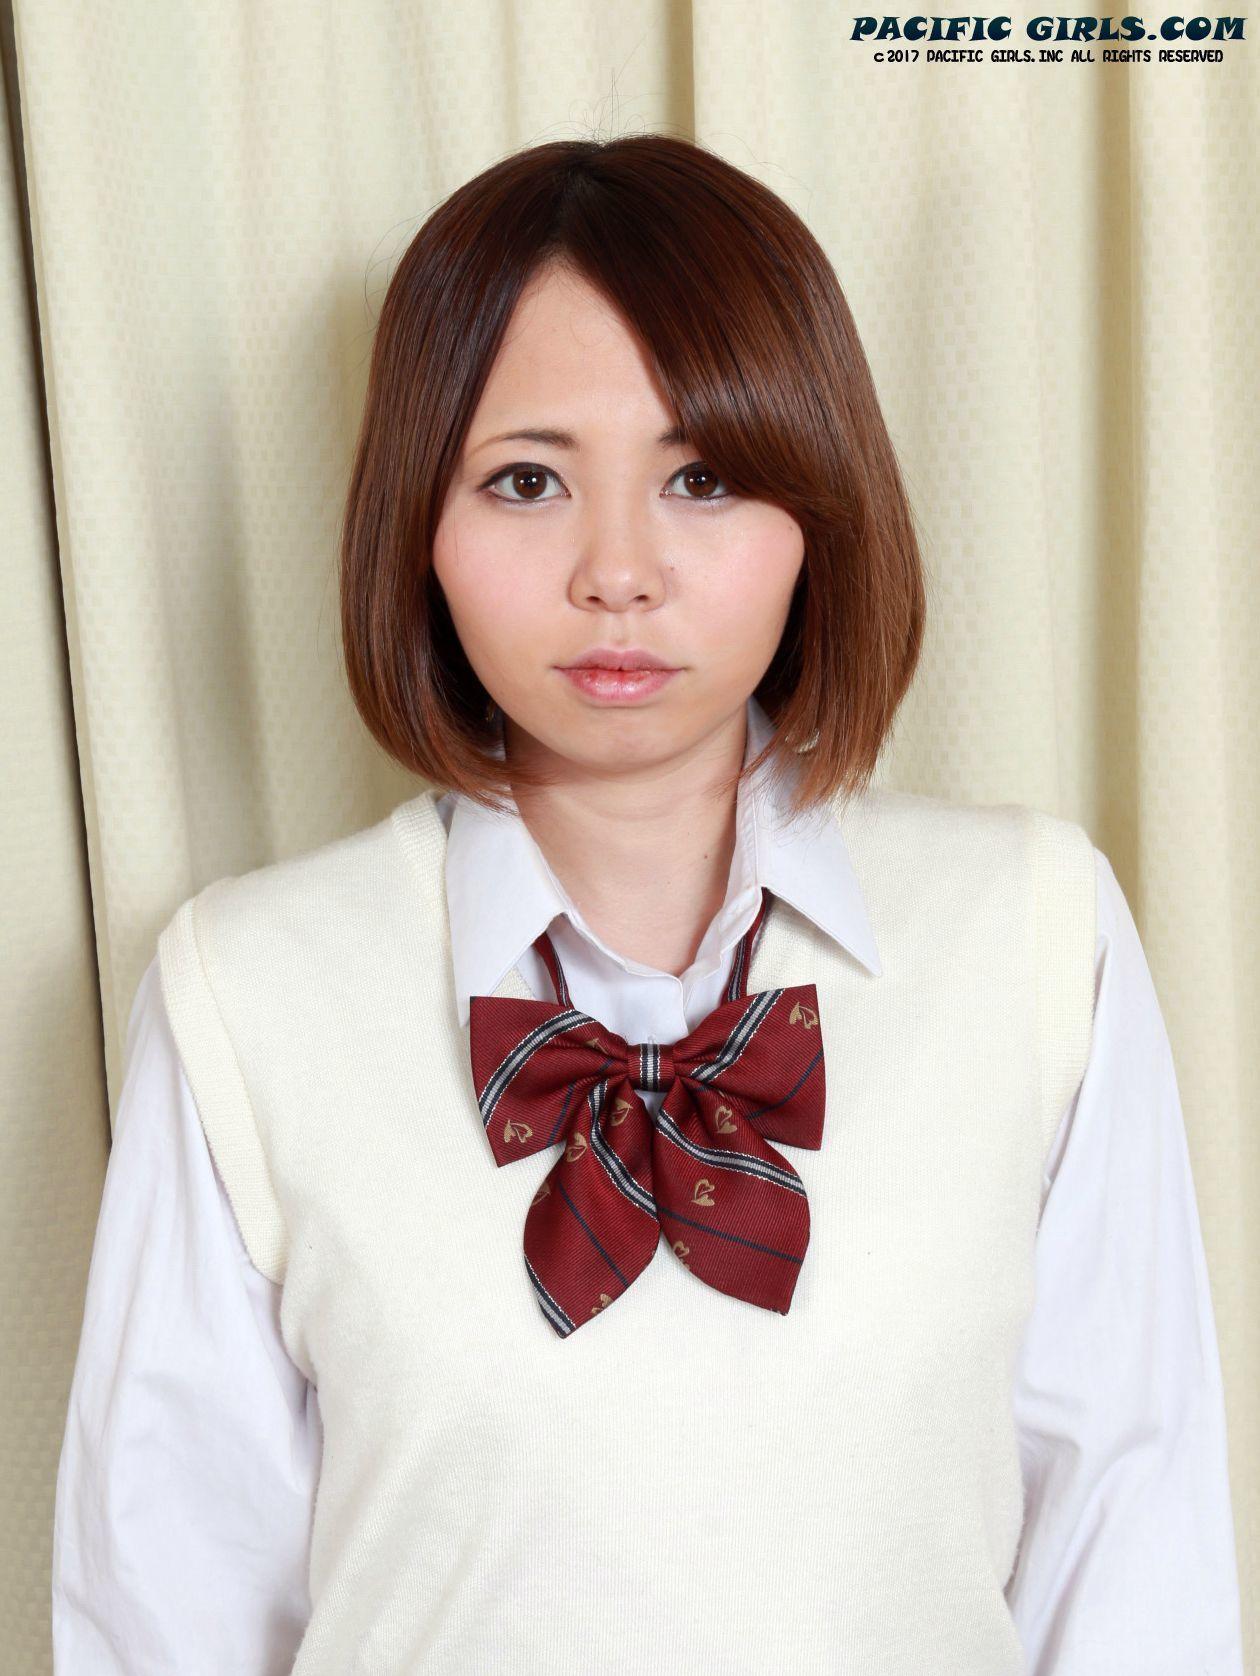 girlsdelta セックス Girlsdelta Ura Bukkake Vip 無修正ぶっかけ Jav 1 xXx Video ...